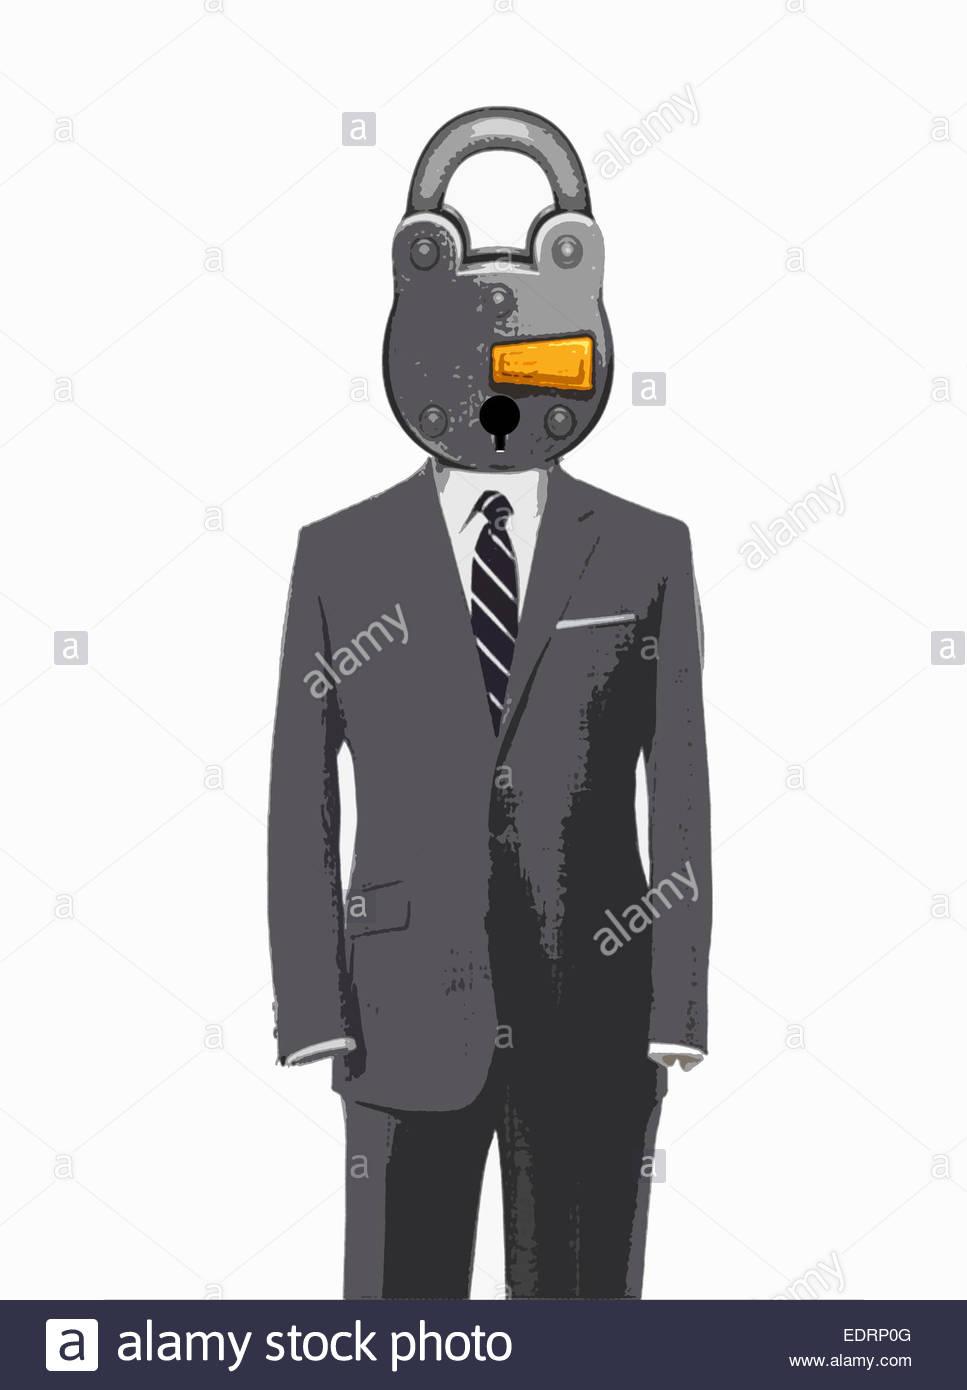 Vorhängeschloss-Kopf auf leere Business-Anzug Stockbild